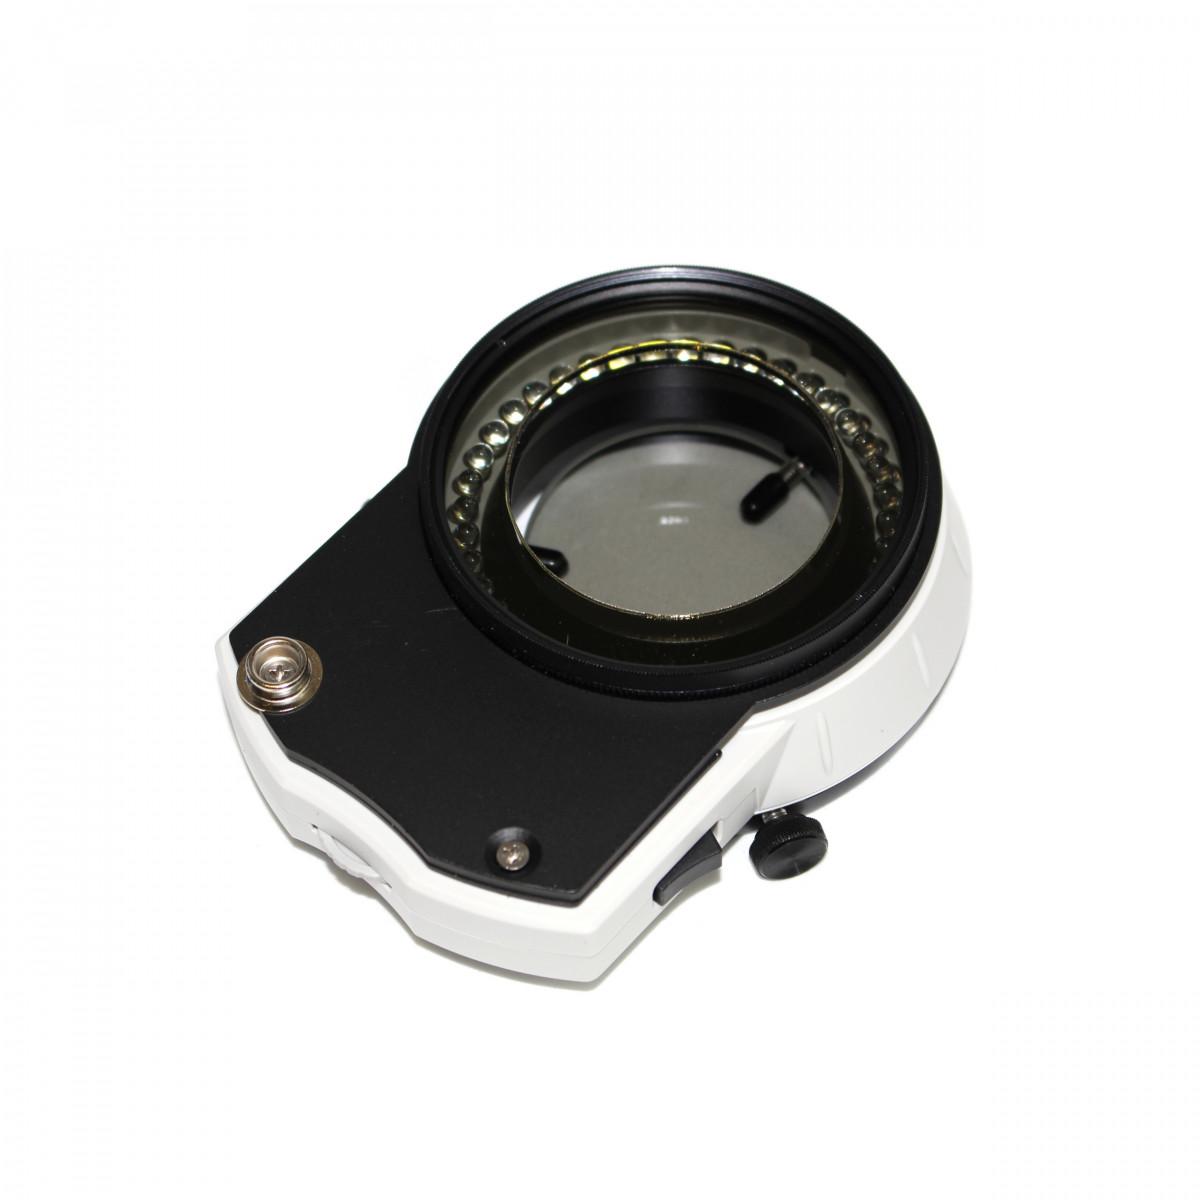 LED3000-PF, bottom